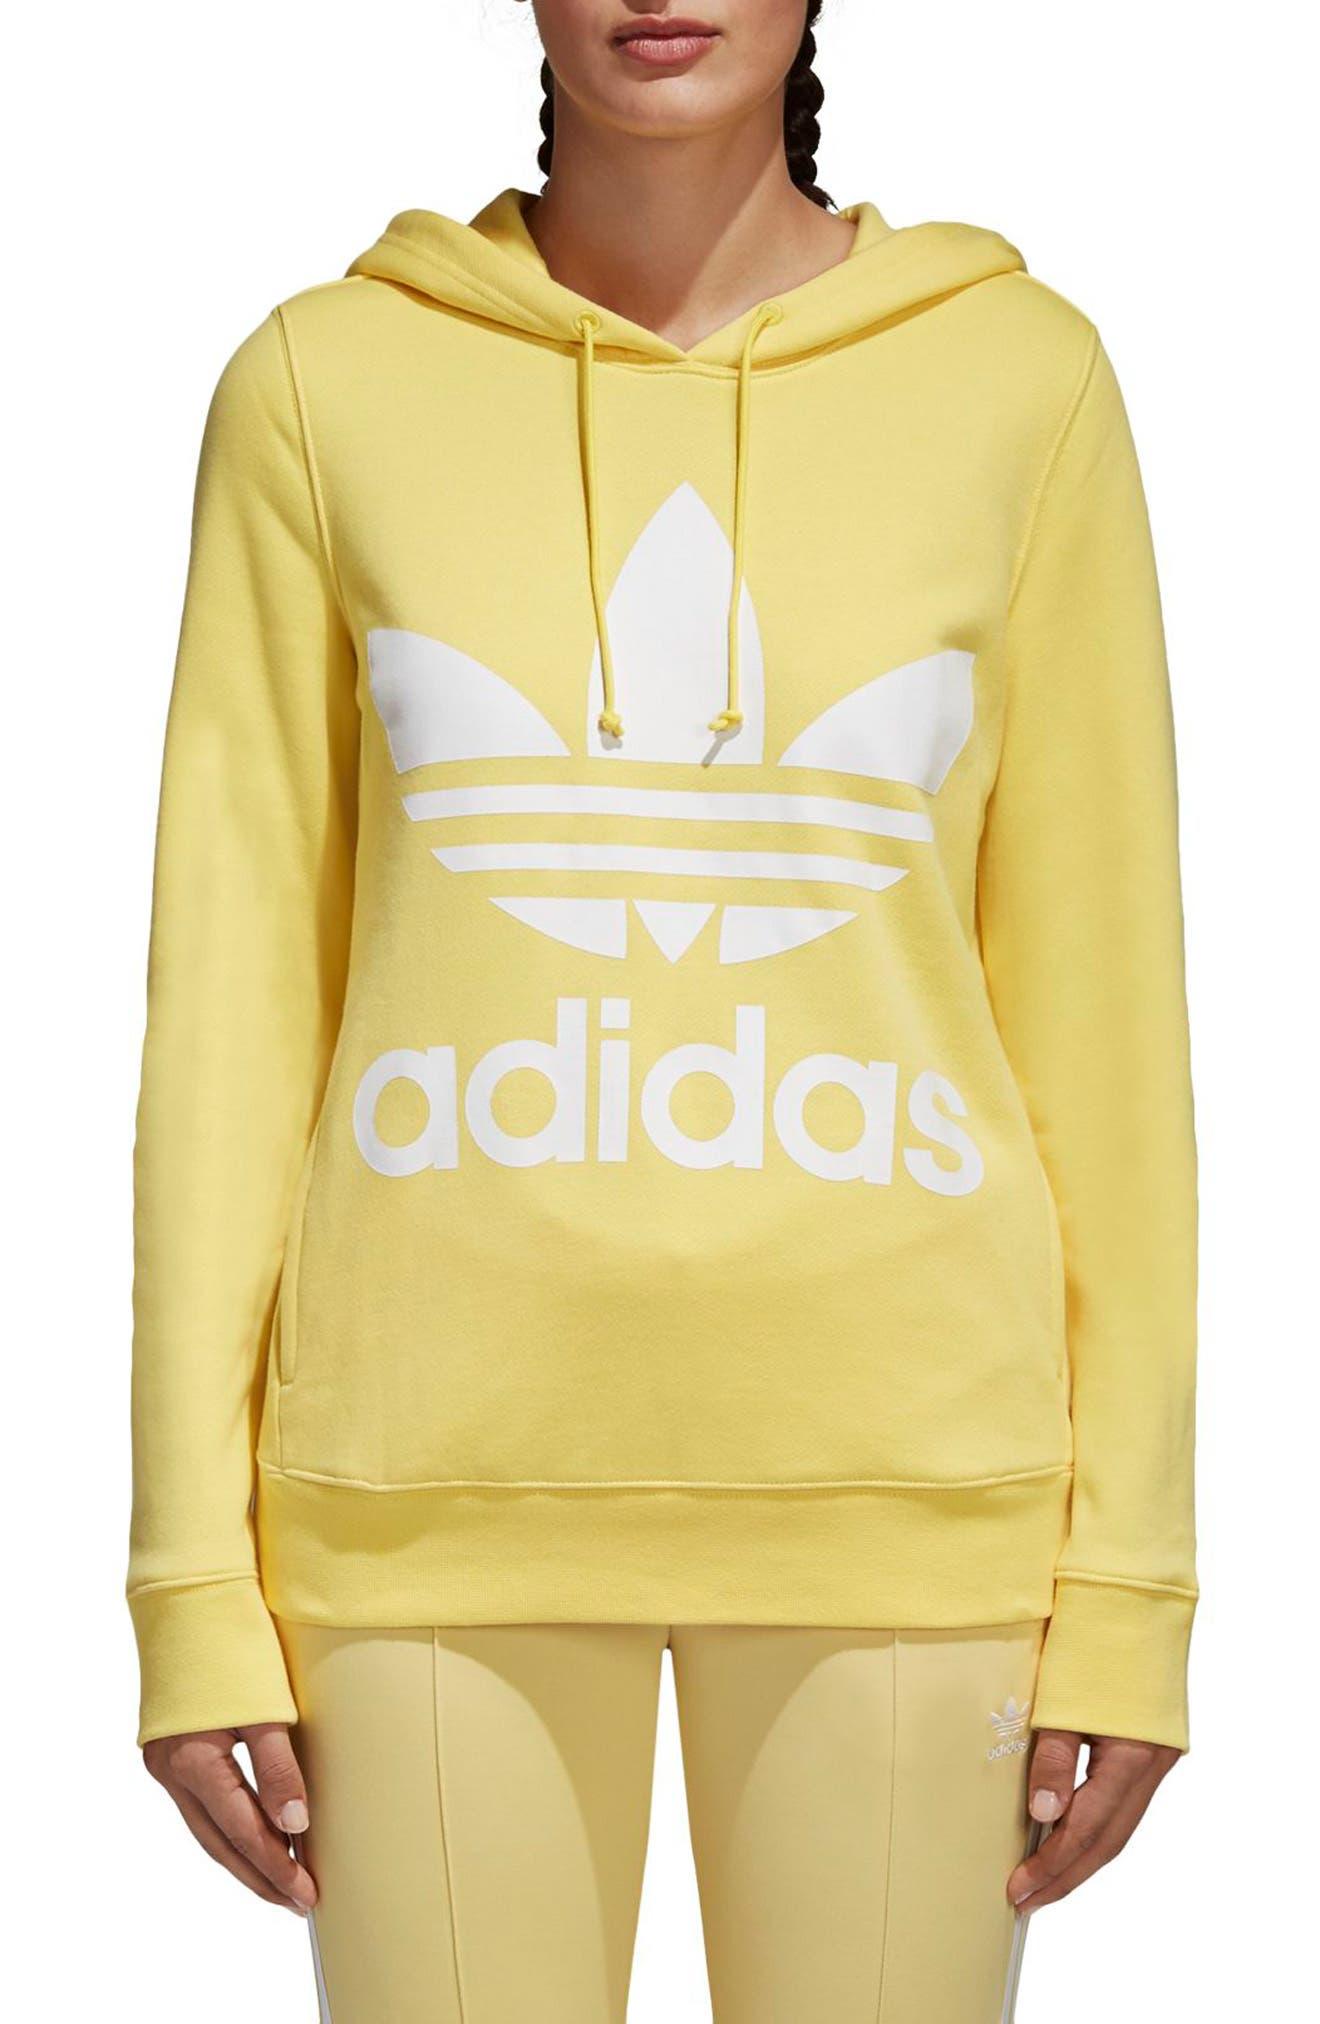 balenciaga hoodie womens yellow